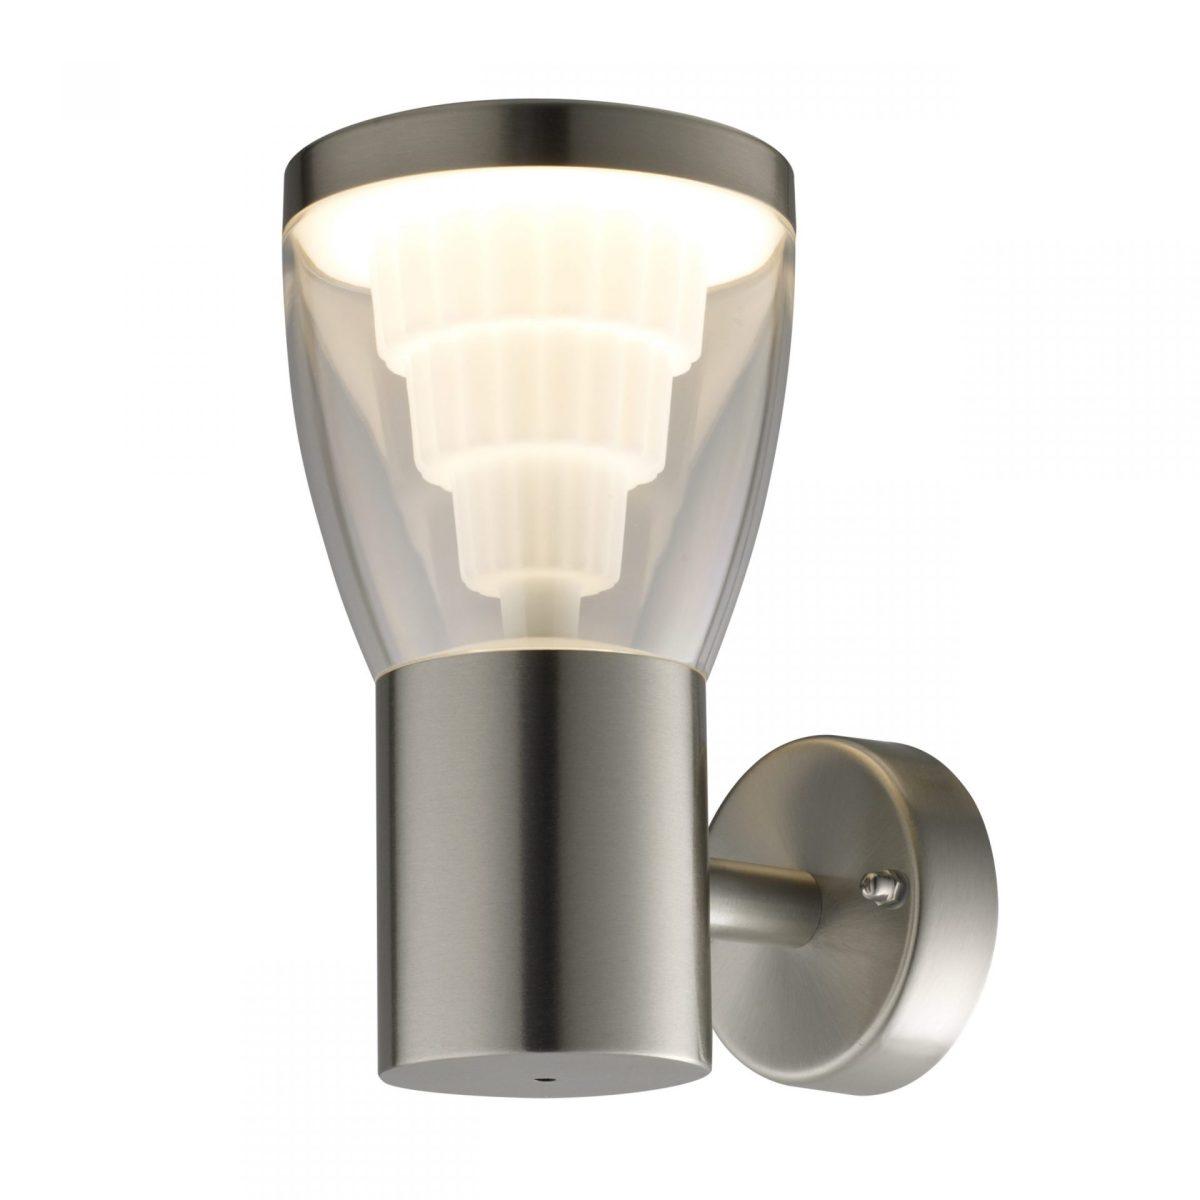 Outdoor Lighting Bulkheads WL-L24 – COMING SOON